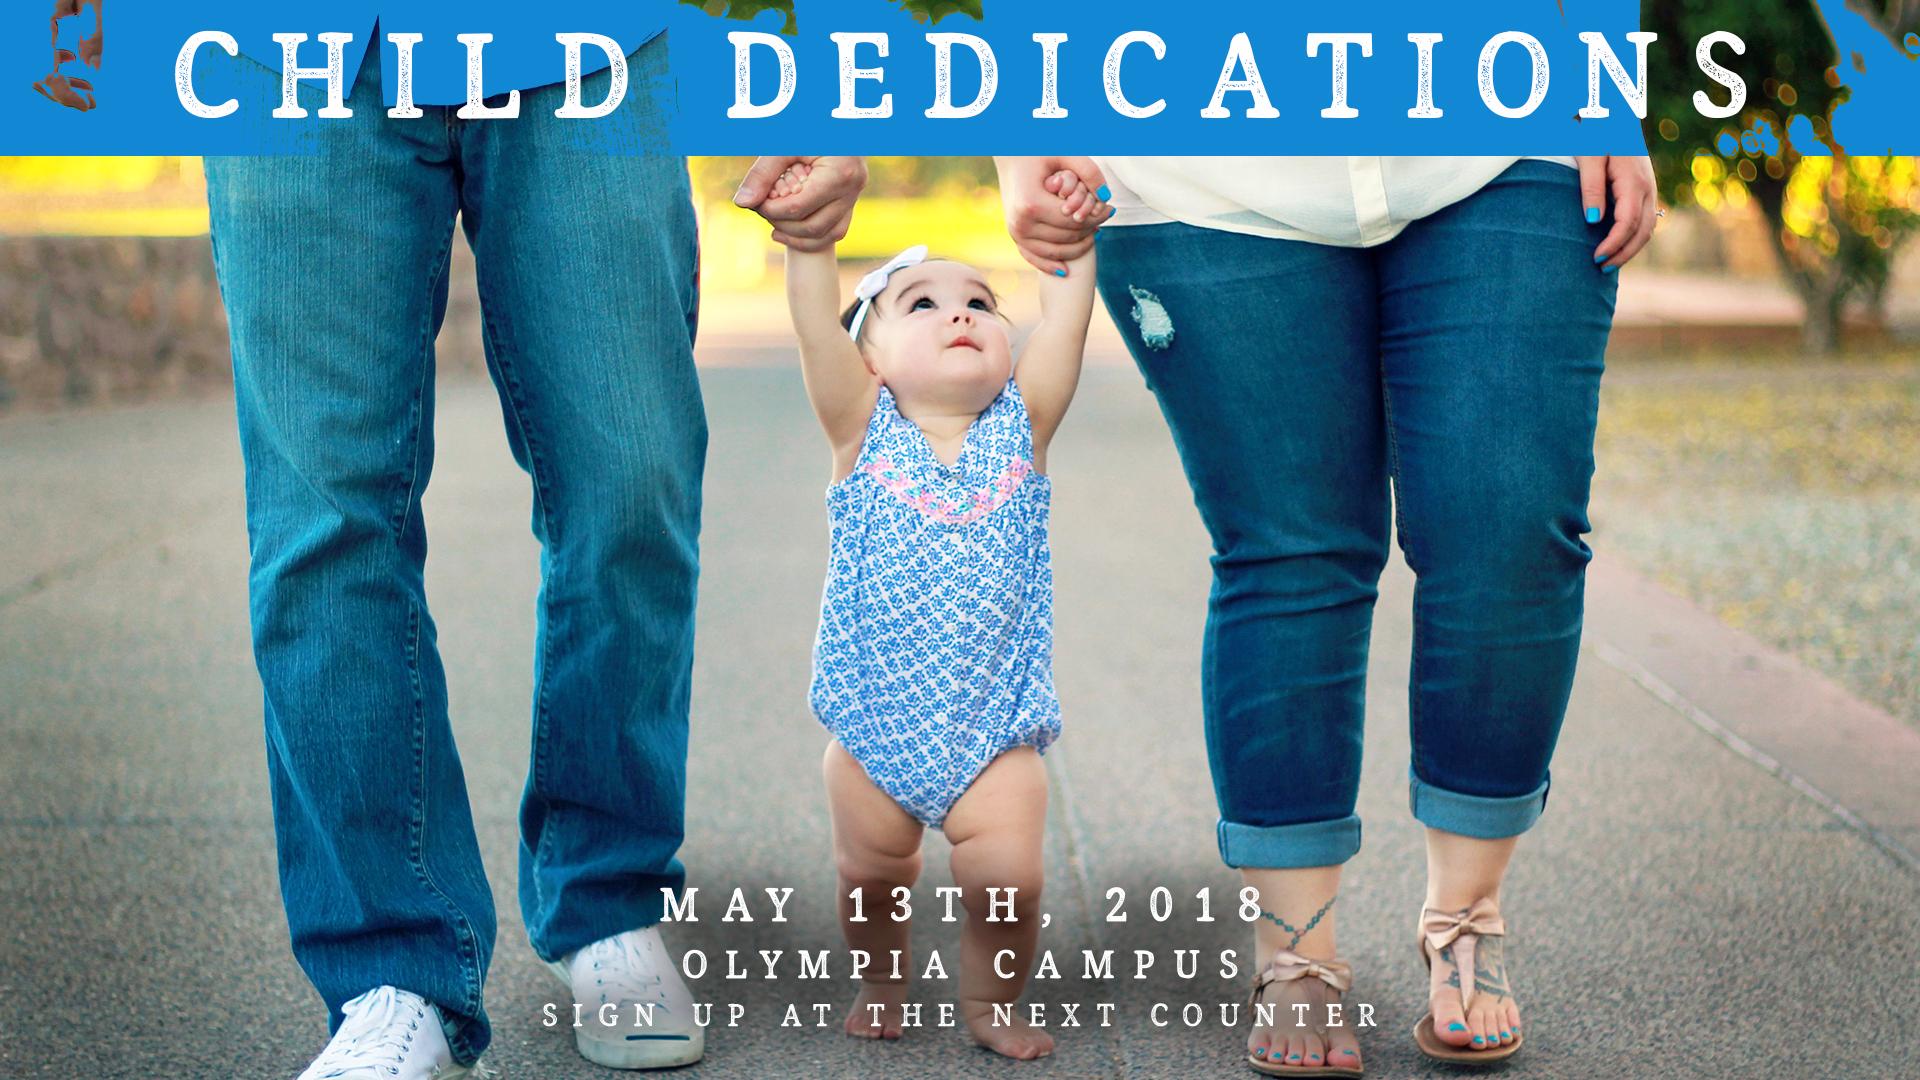 Child Dedication Announcement Slide Olympia Campus (1).jpg